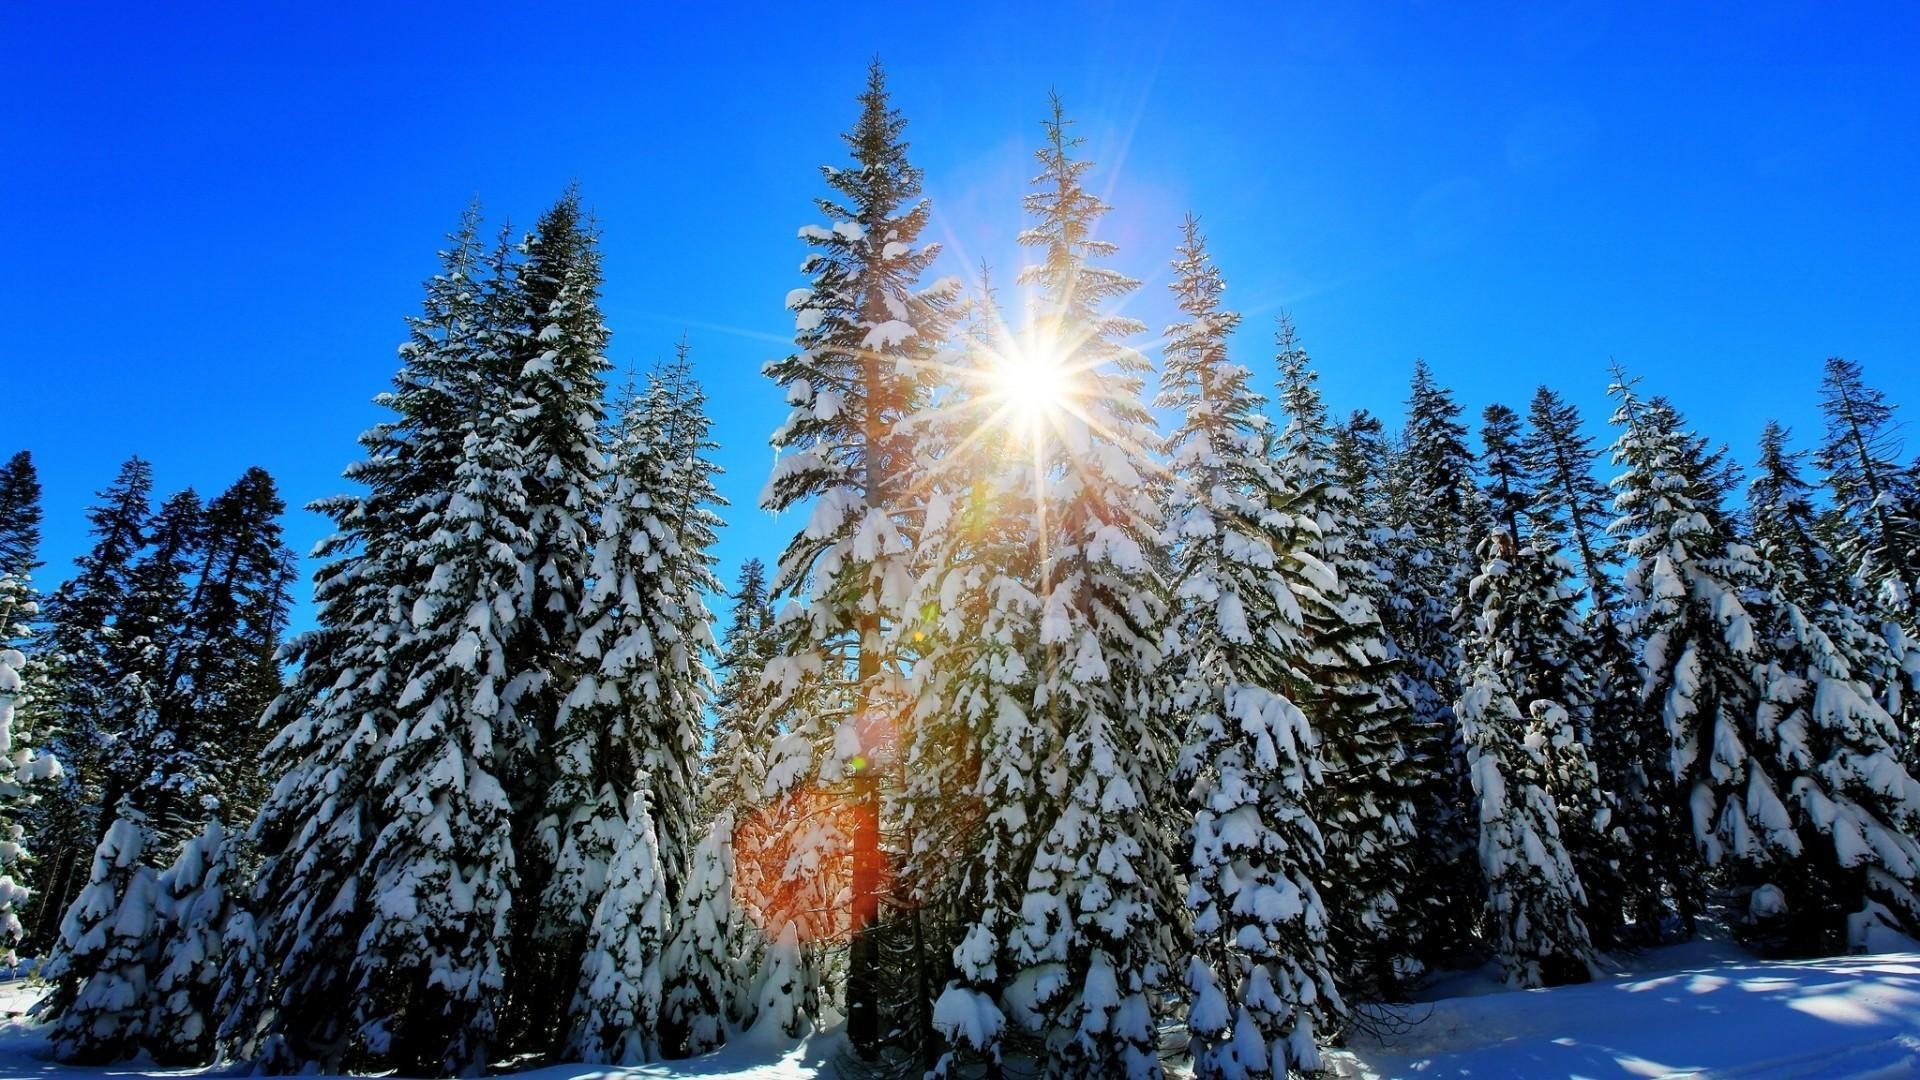 мелких картинки на рабочий стол зимний лес солнце на весь экран обезьяна символ наступающего